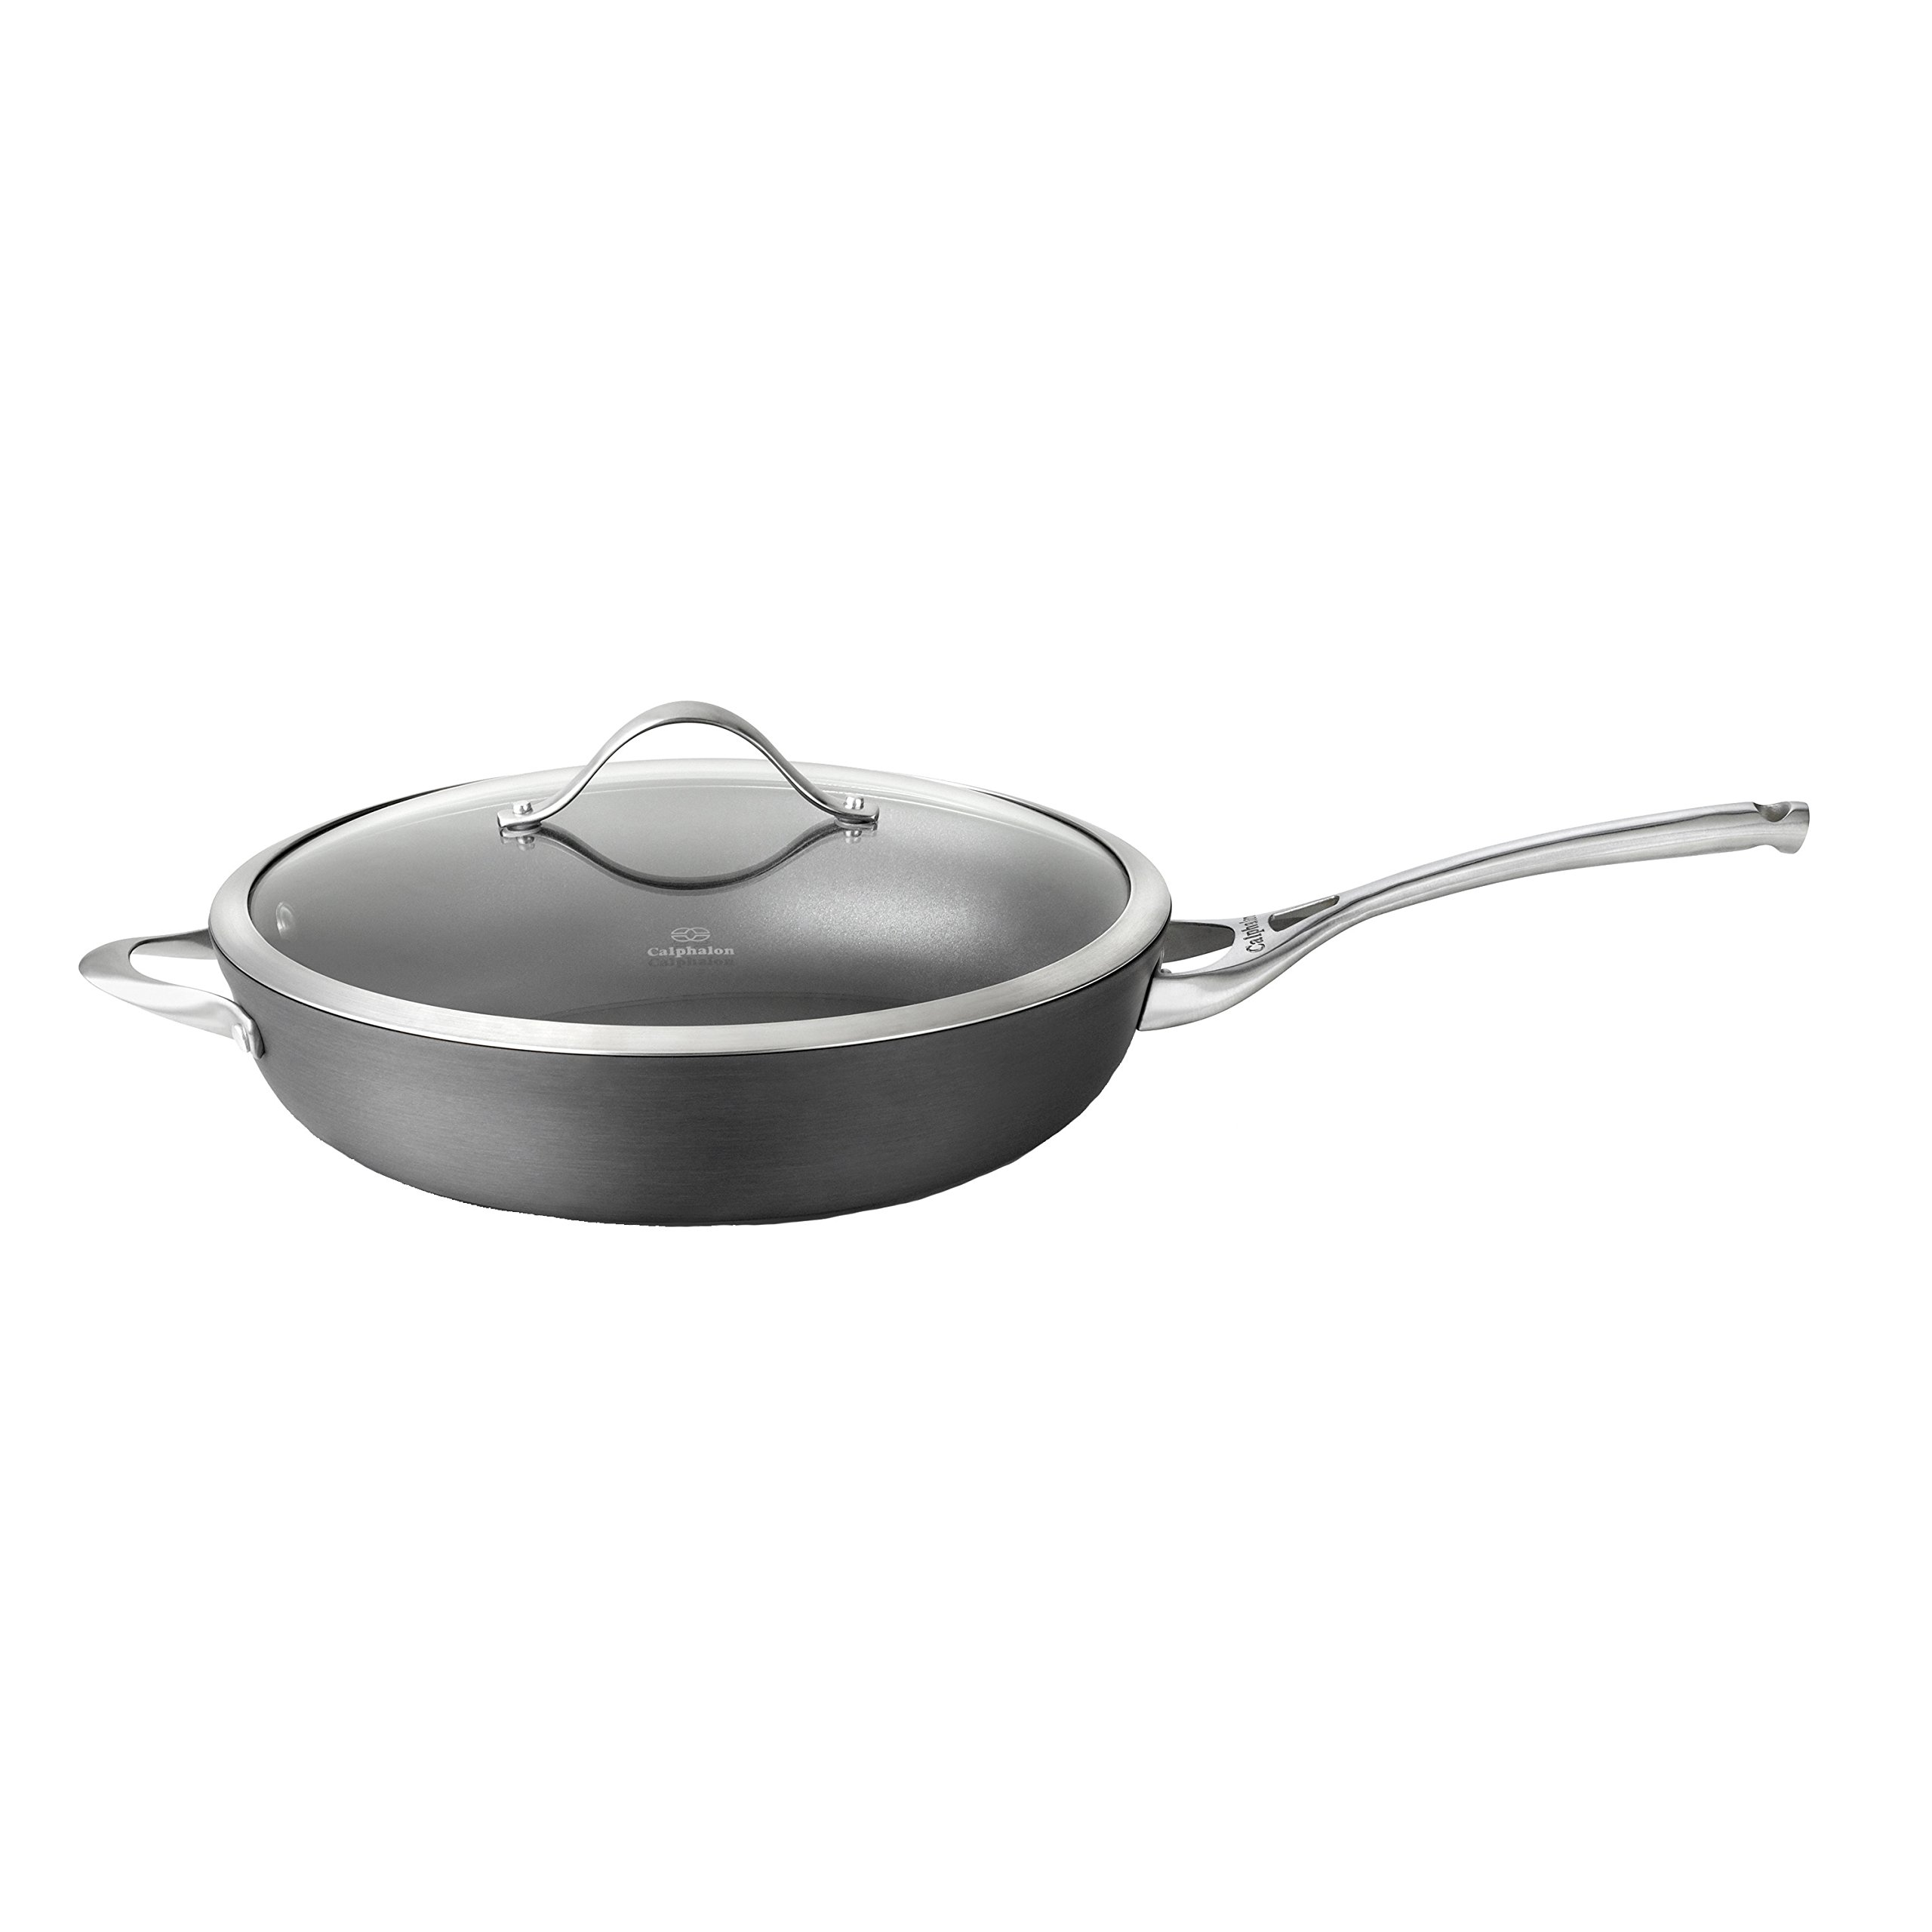 Calphalon Contemporary Hard-Anodized Aluminum Nonstick Cookware, Deep Skillet, 13-inch, Black